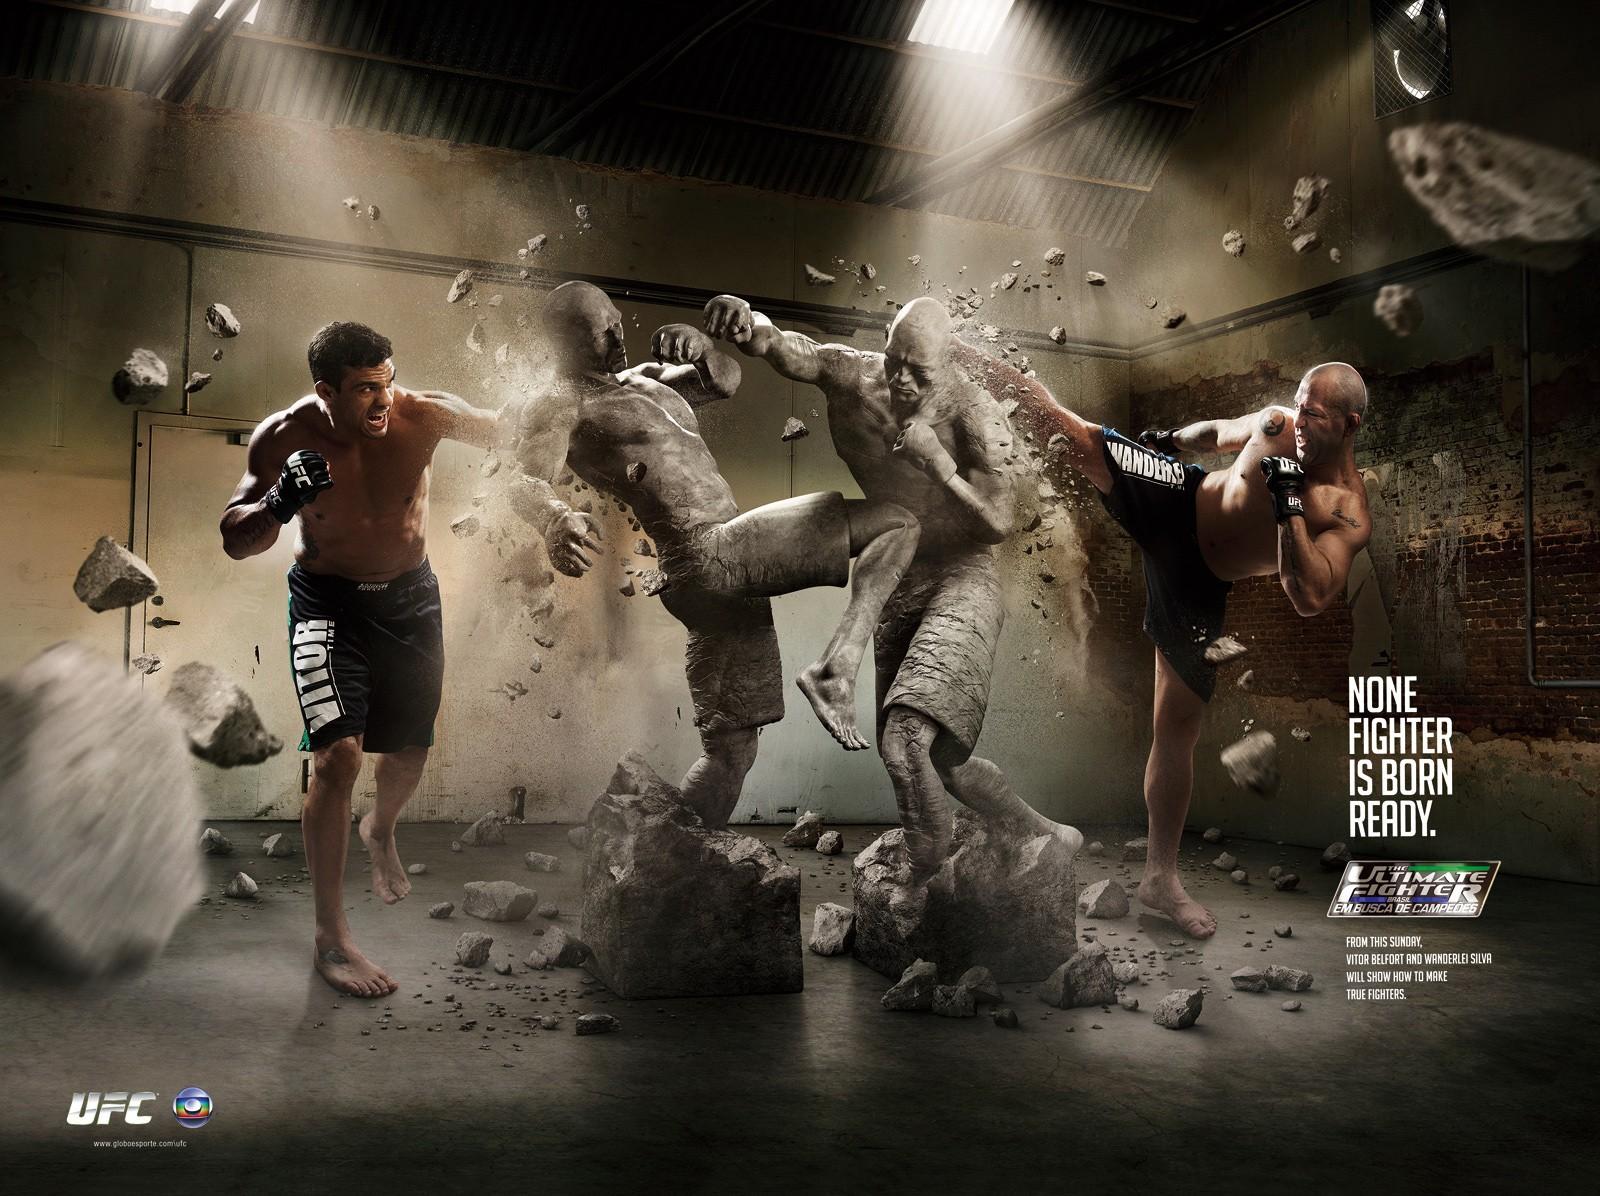 Fight Men Wallpaper 1600x1196 Fight Men Brazil UFC Statues 1600x1196